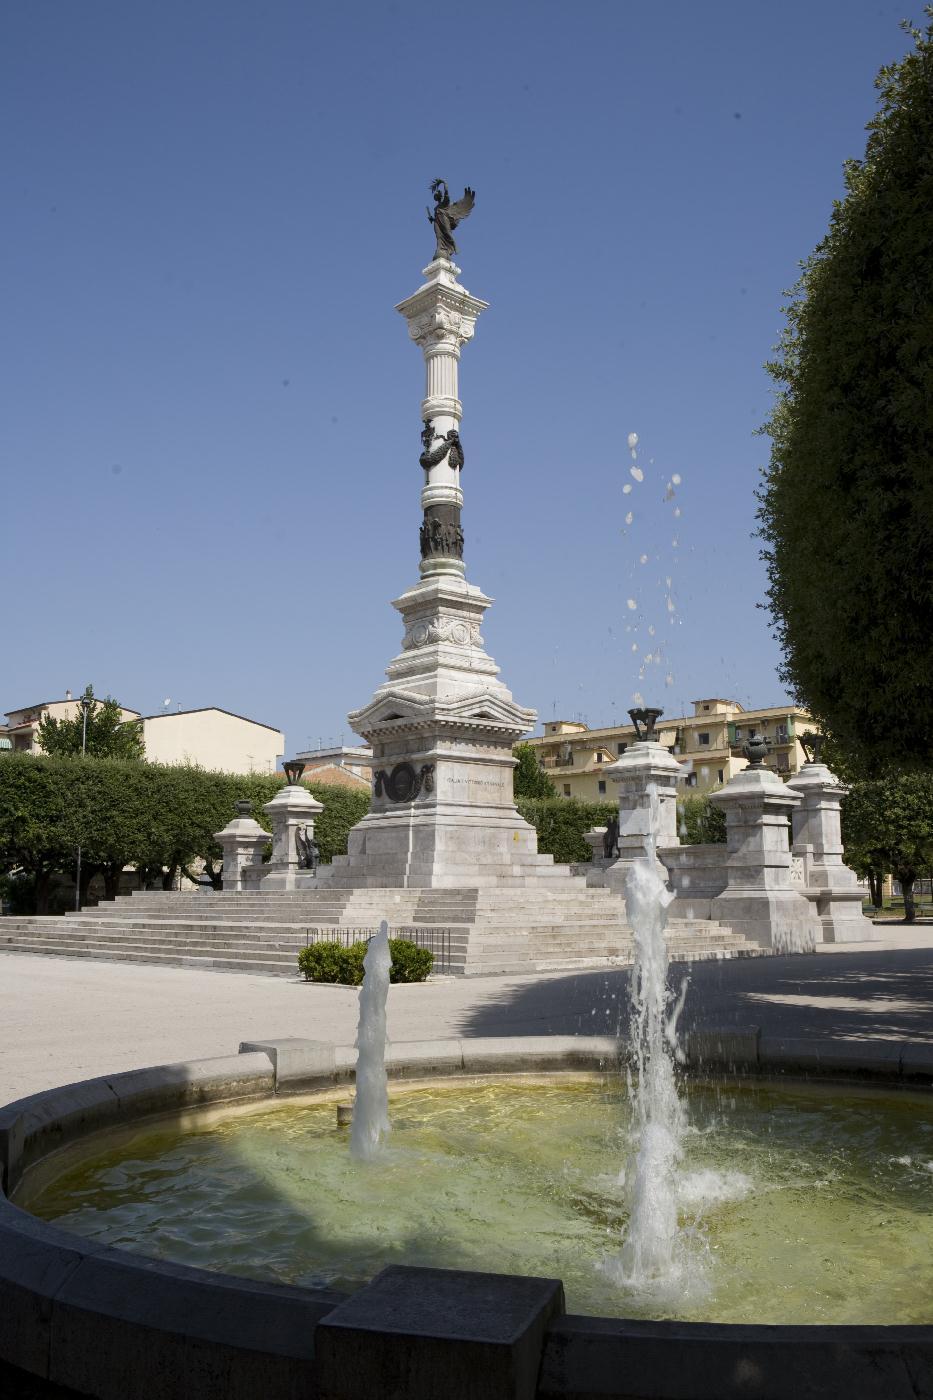 Monumento ai garibaldini santa maria capua vetere - Piscina santa maria capua vetere ...